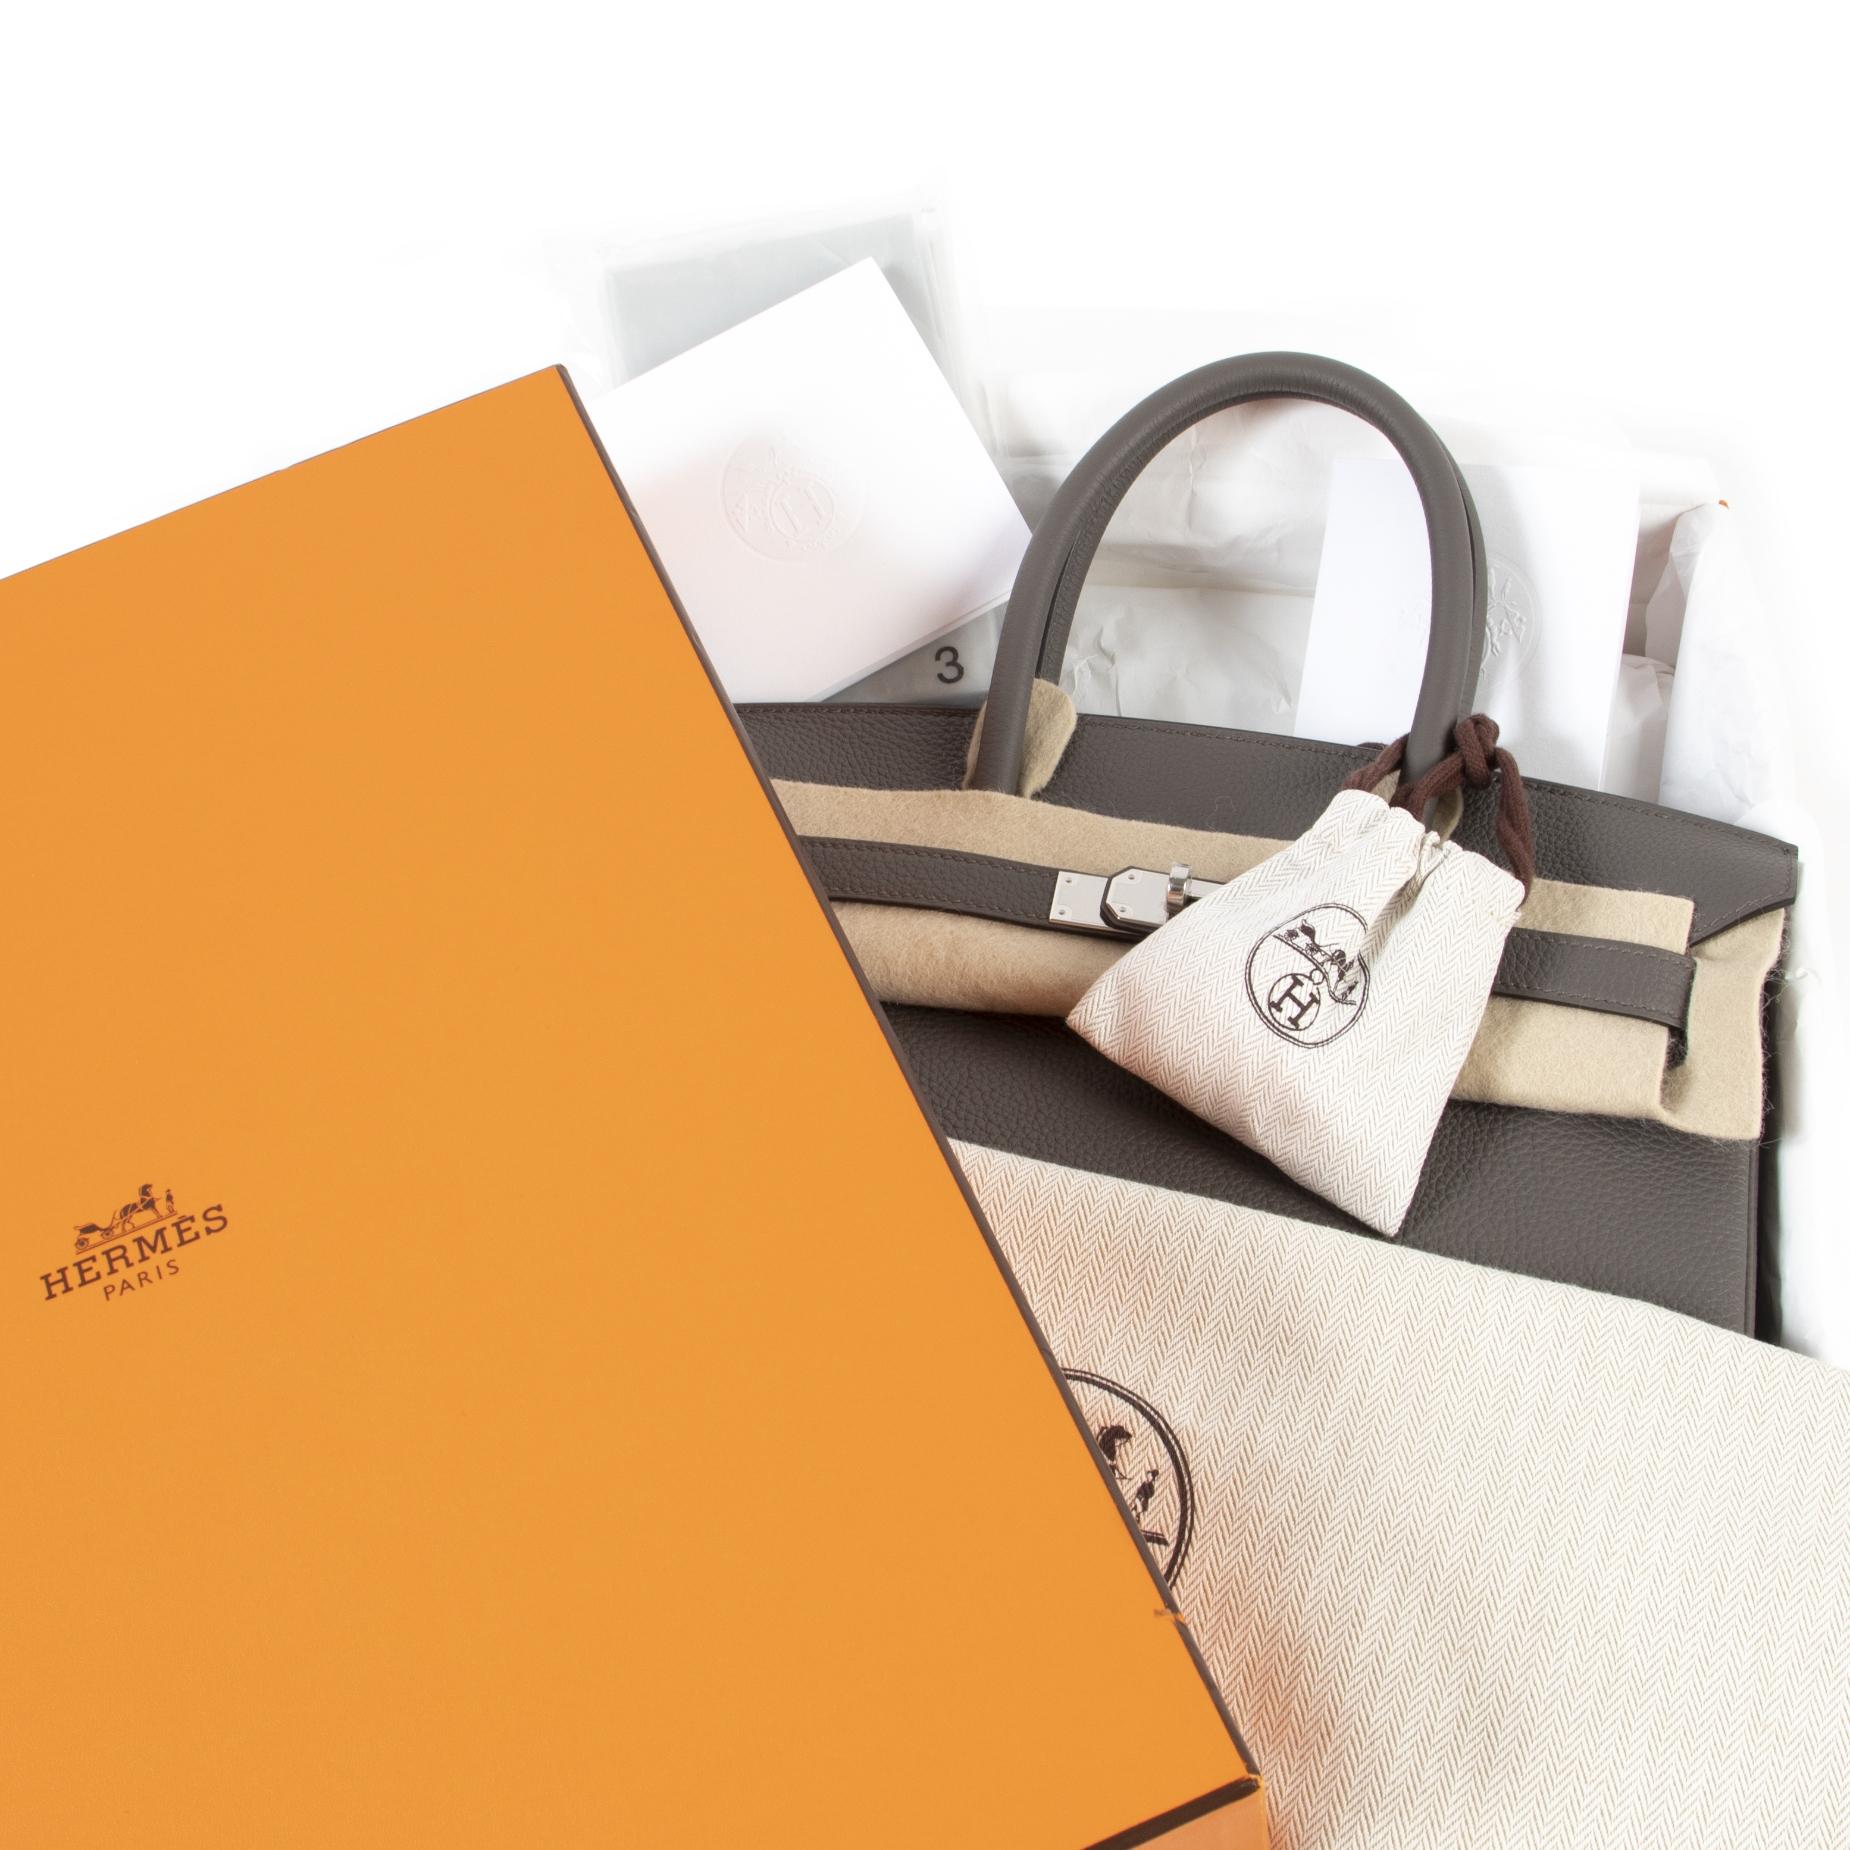 100% authentic Hermès Birkin 30 Etain Togo PHW for the best price at Labellov secondhand luxury